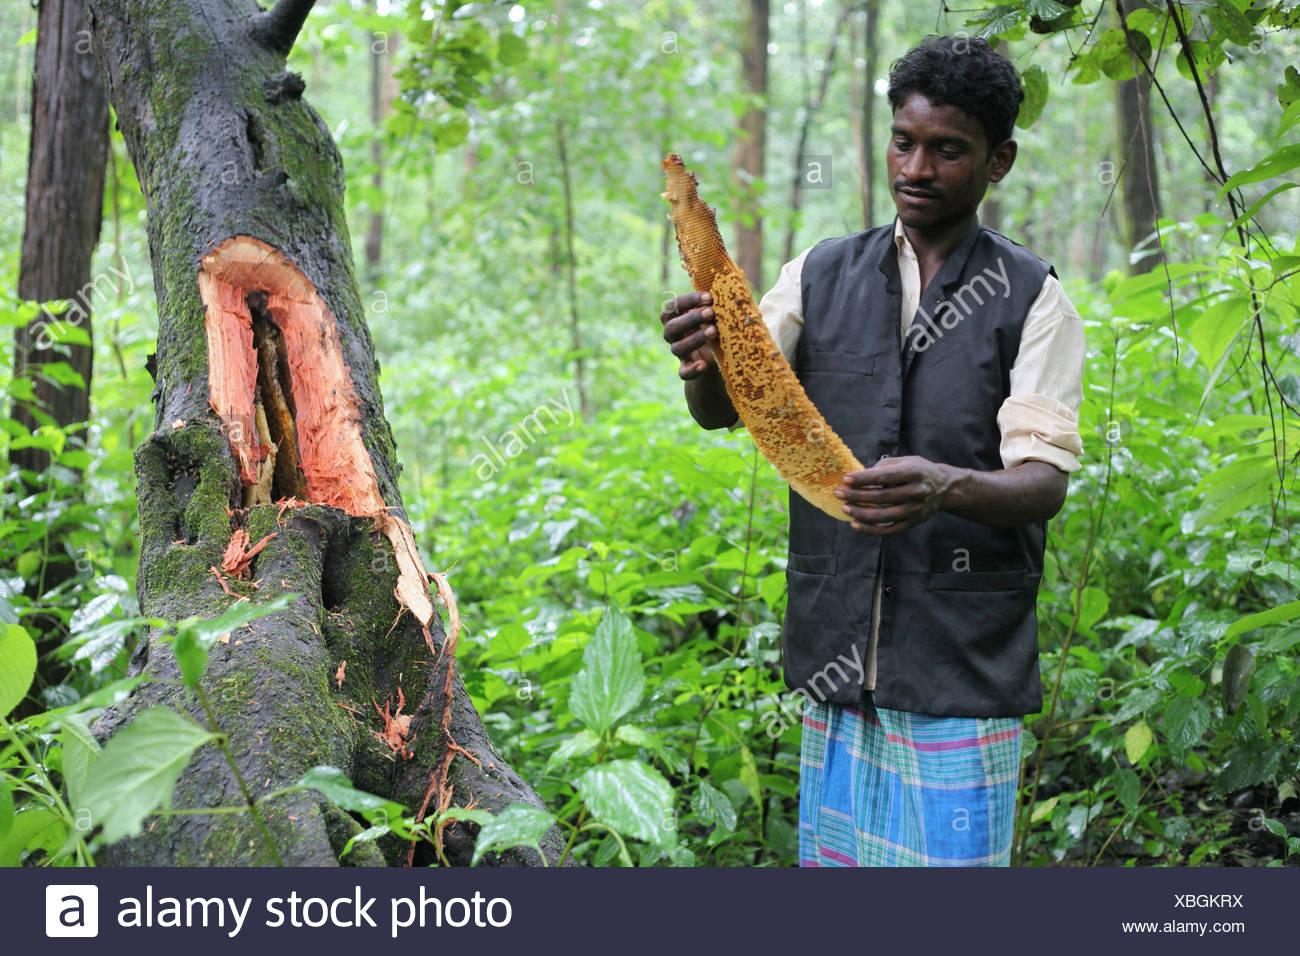 Baiga man with honeycomb. Madhya Pradesh, India - Stock Image